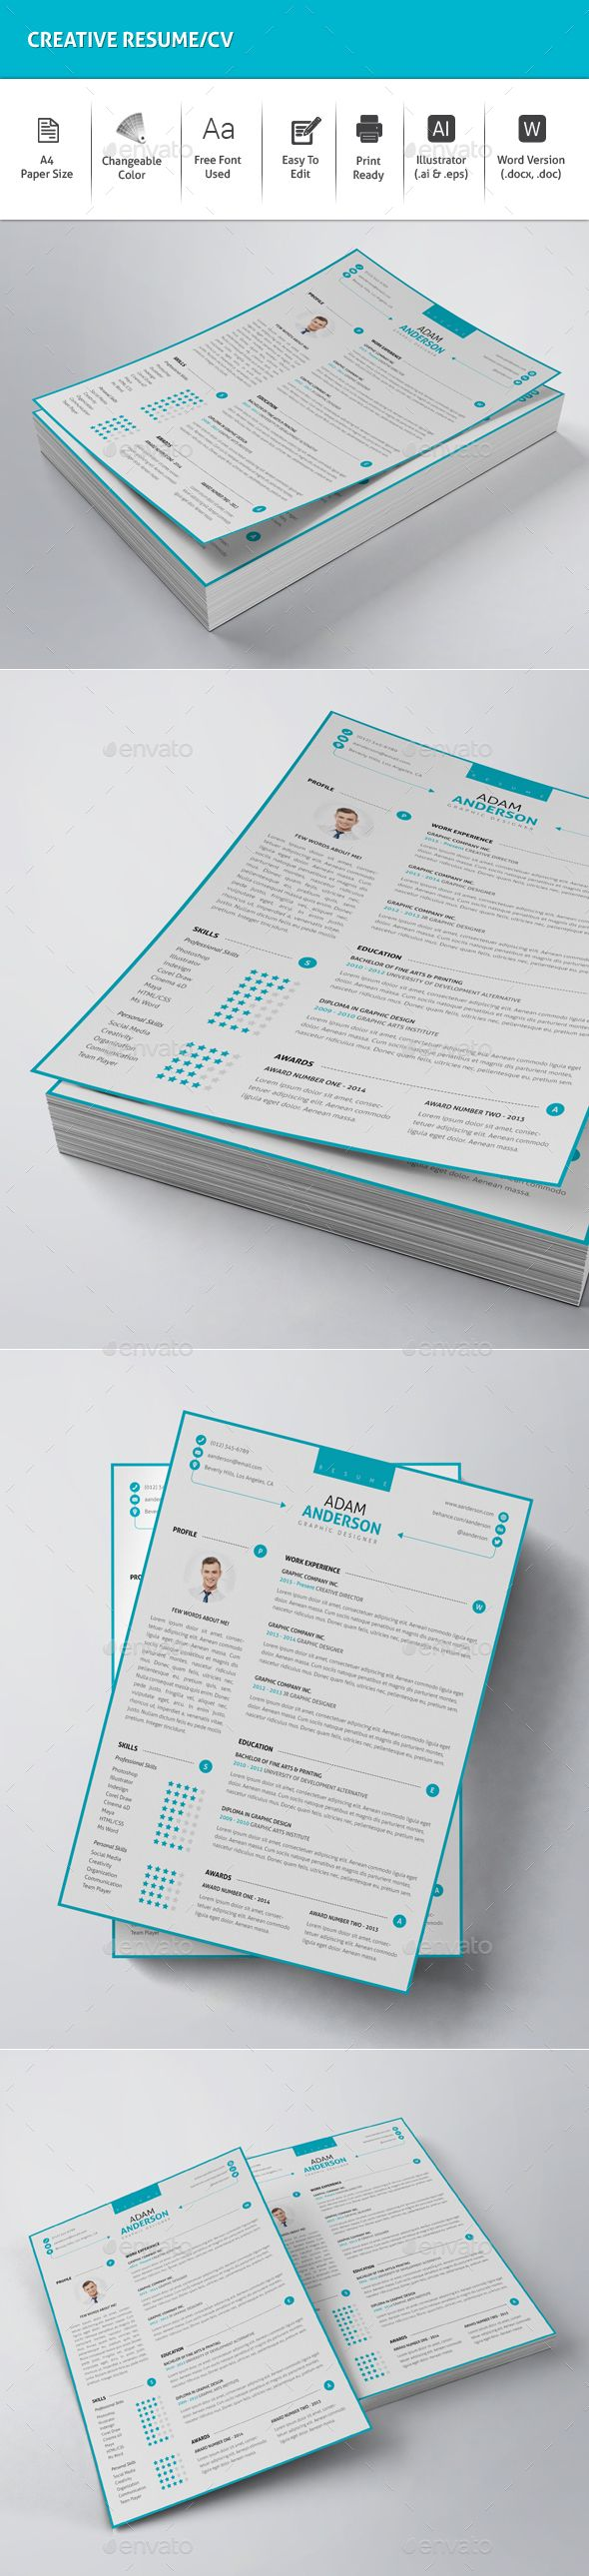 Creative Resume / CV Vector Template EPS, AI #design Download: http://graphicriver.net/item/-creative-resumecv/13828429?ref=ksioks